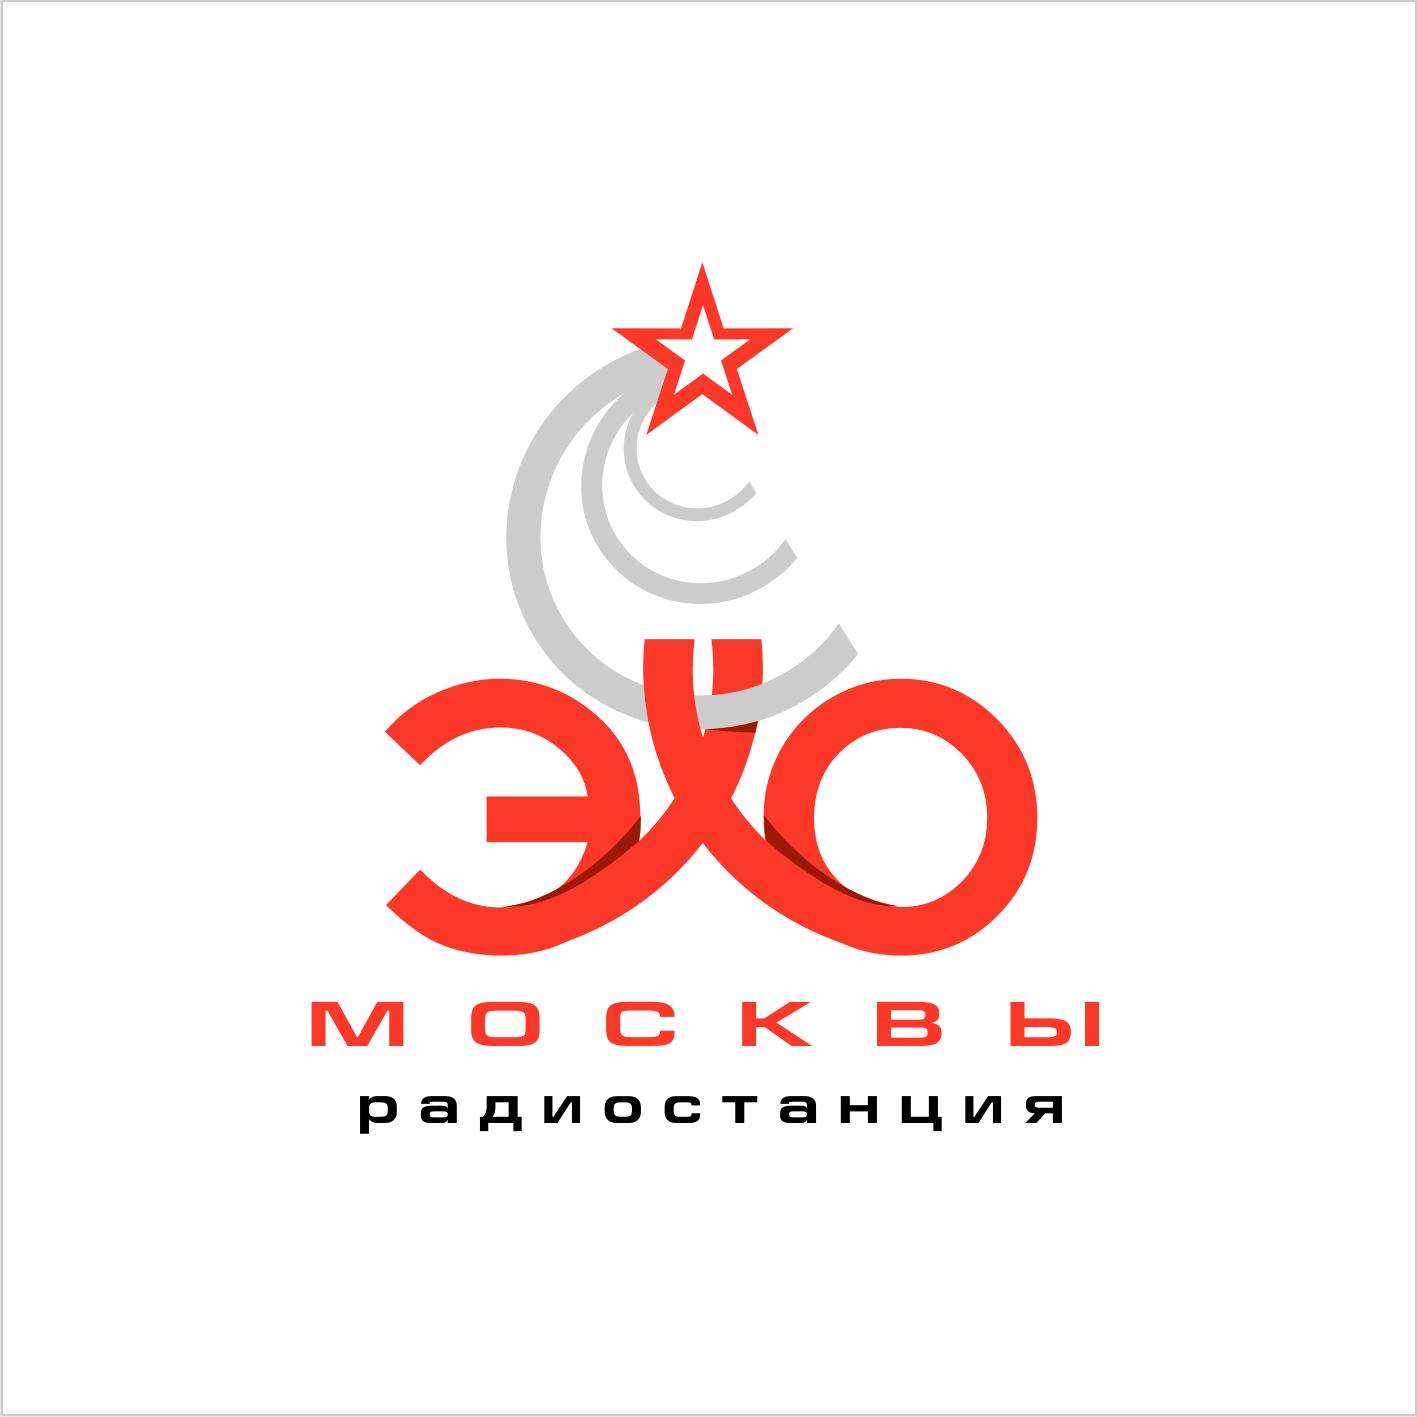 Дизайн логотипа р/с Эхо Москвы. фото f_32456266f3fb1e24.jpg